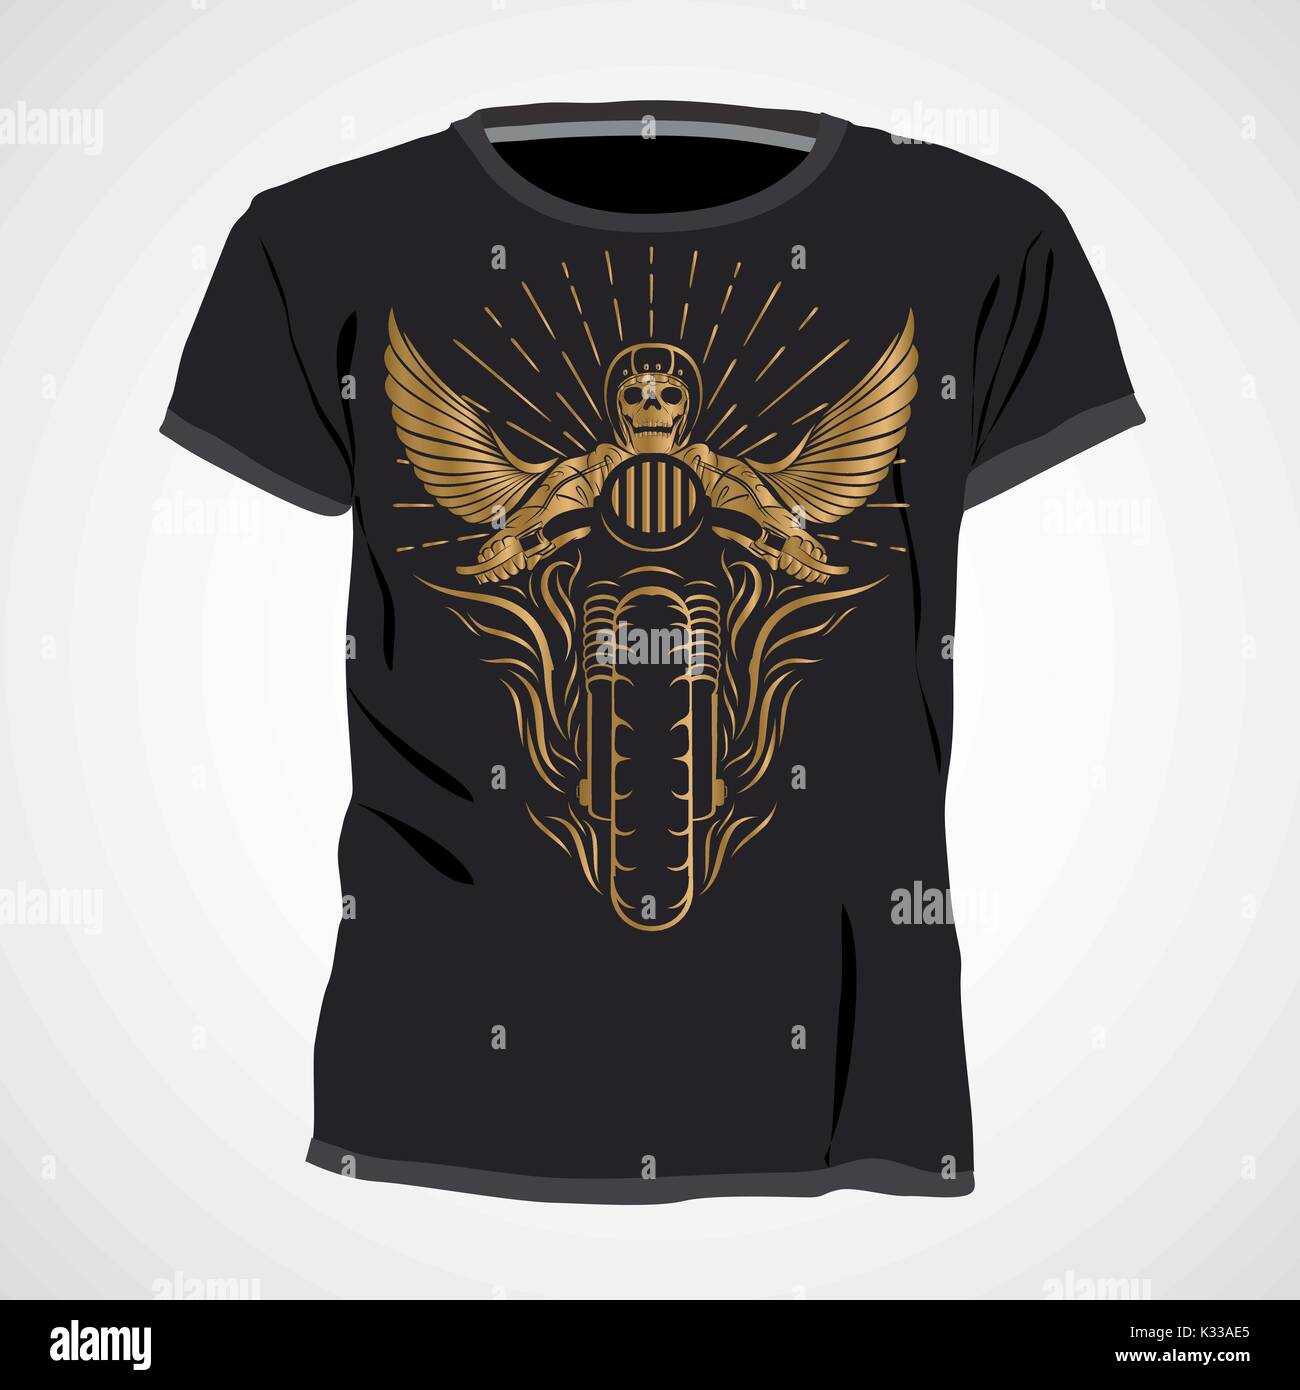 Skull t shirt design template vector illustration stock for T shirt typography template